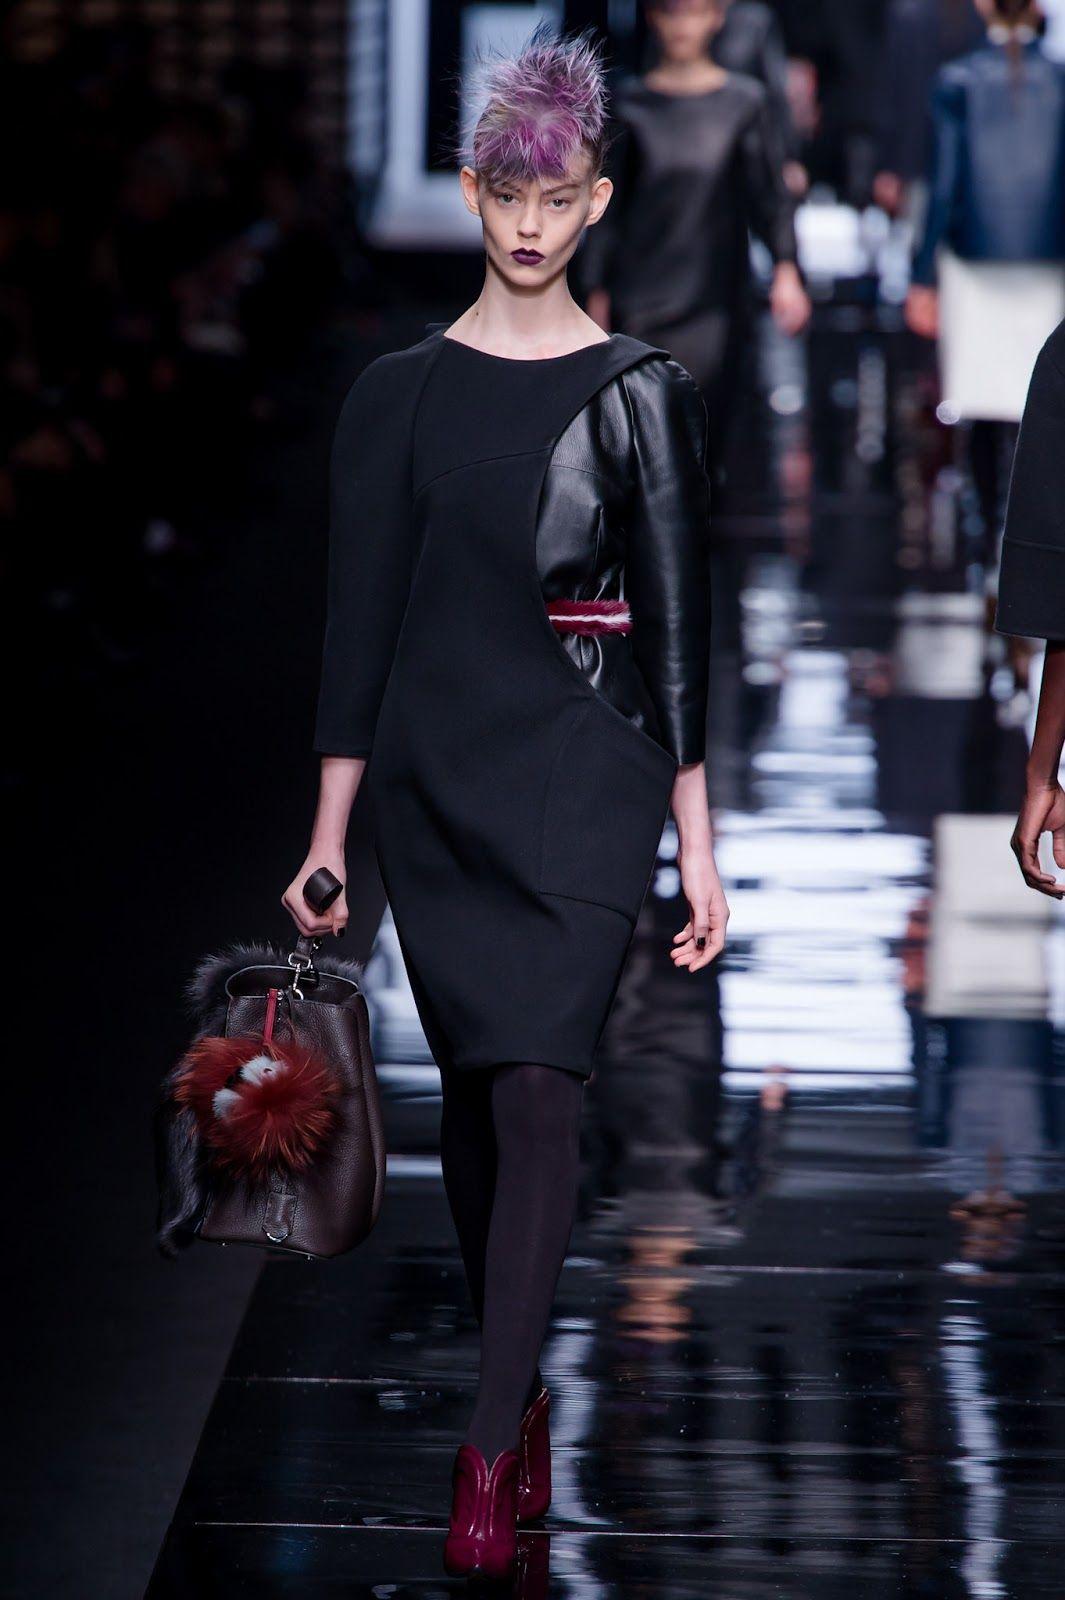 fendi f/w 13.14 milan | visual optimism; fashion editorials, shows, campaigns & more!